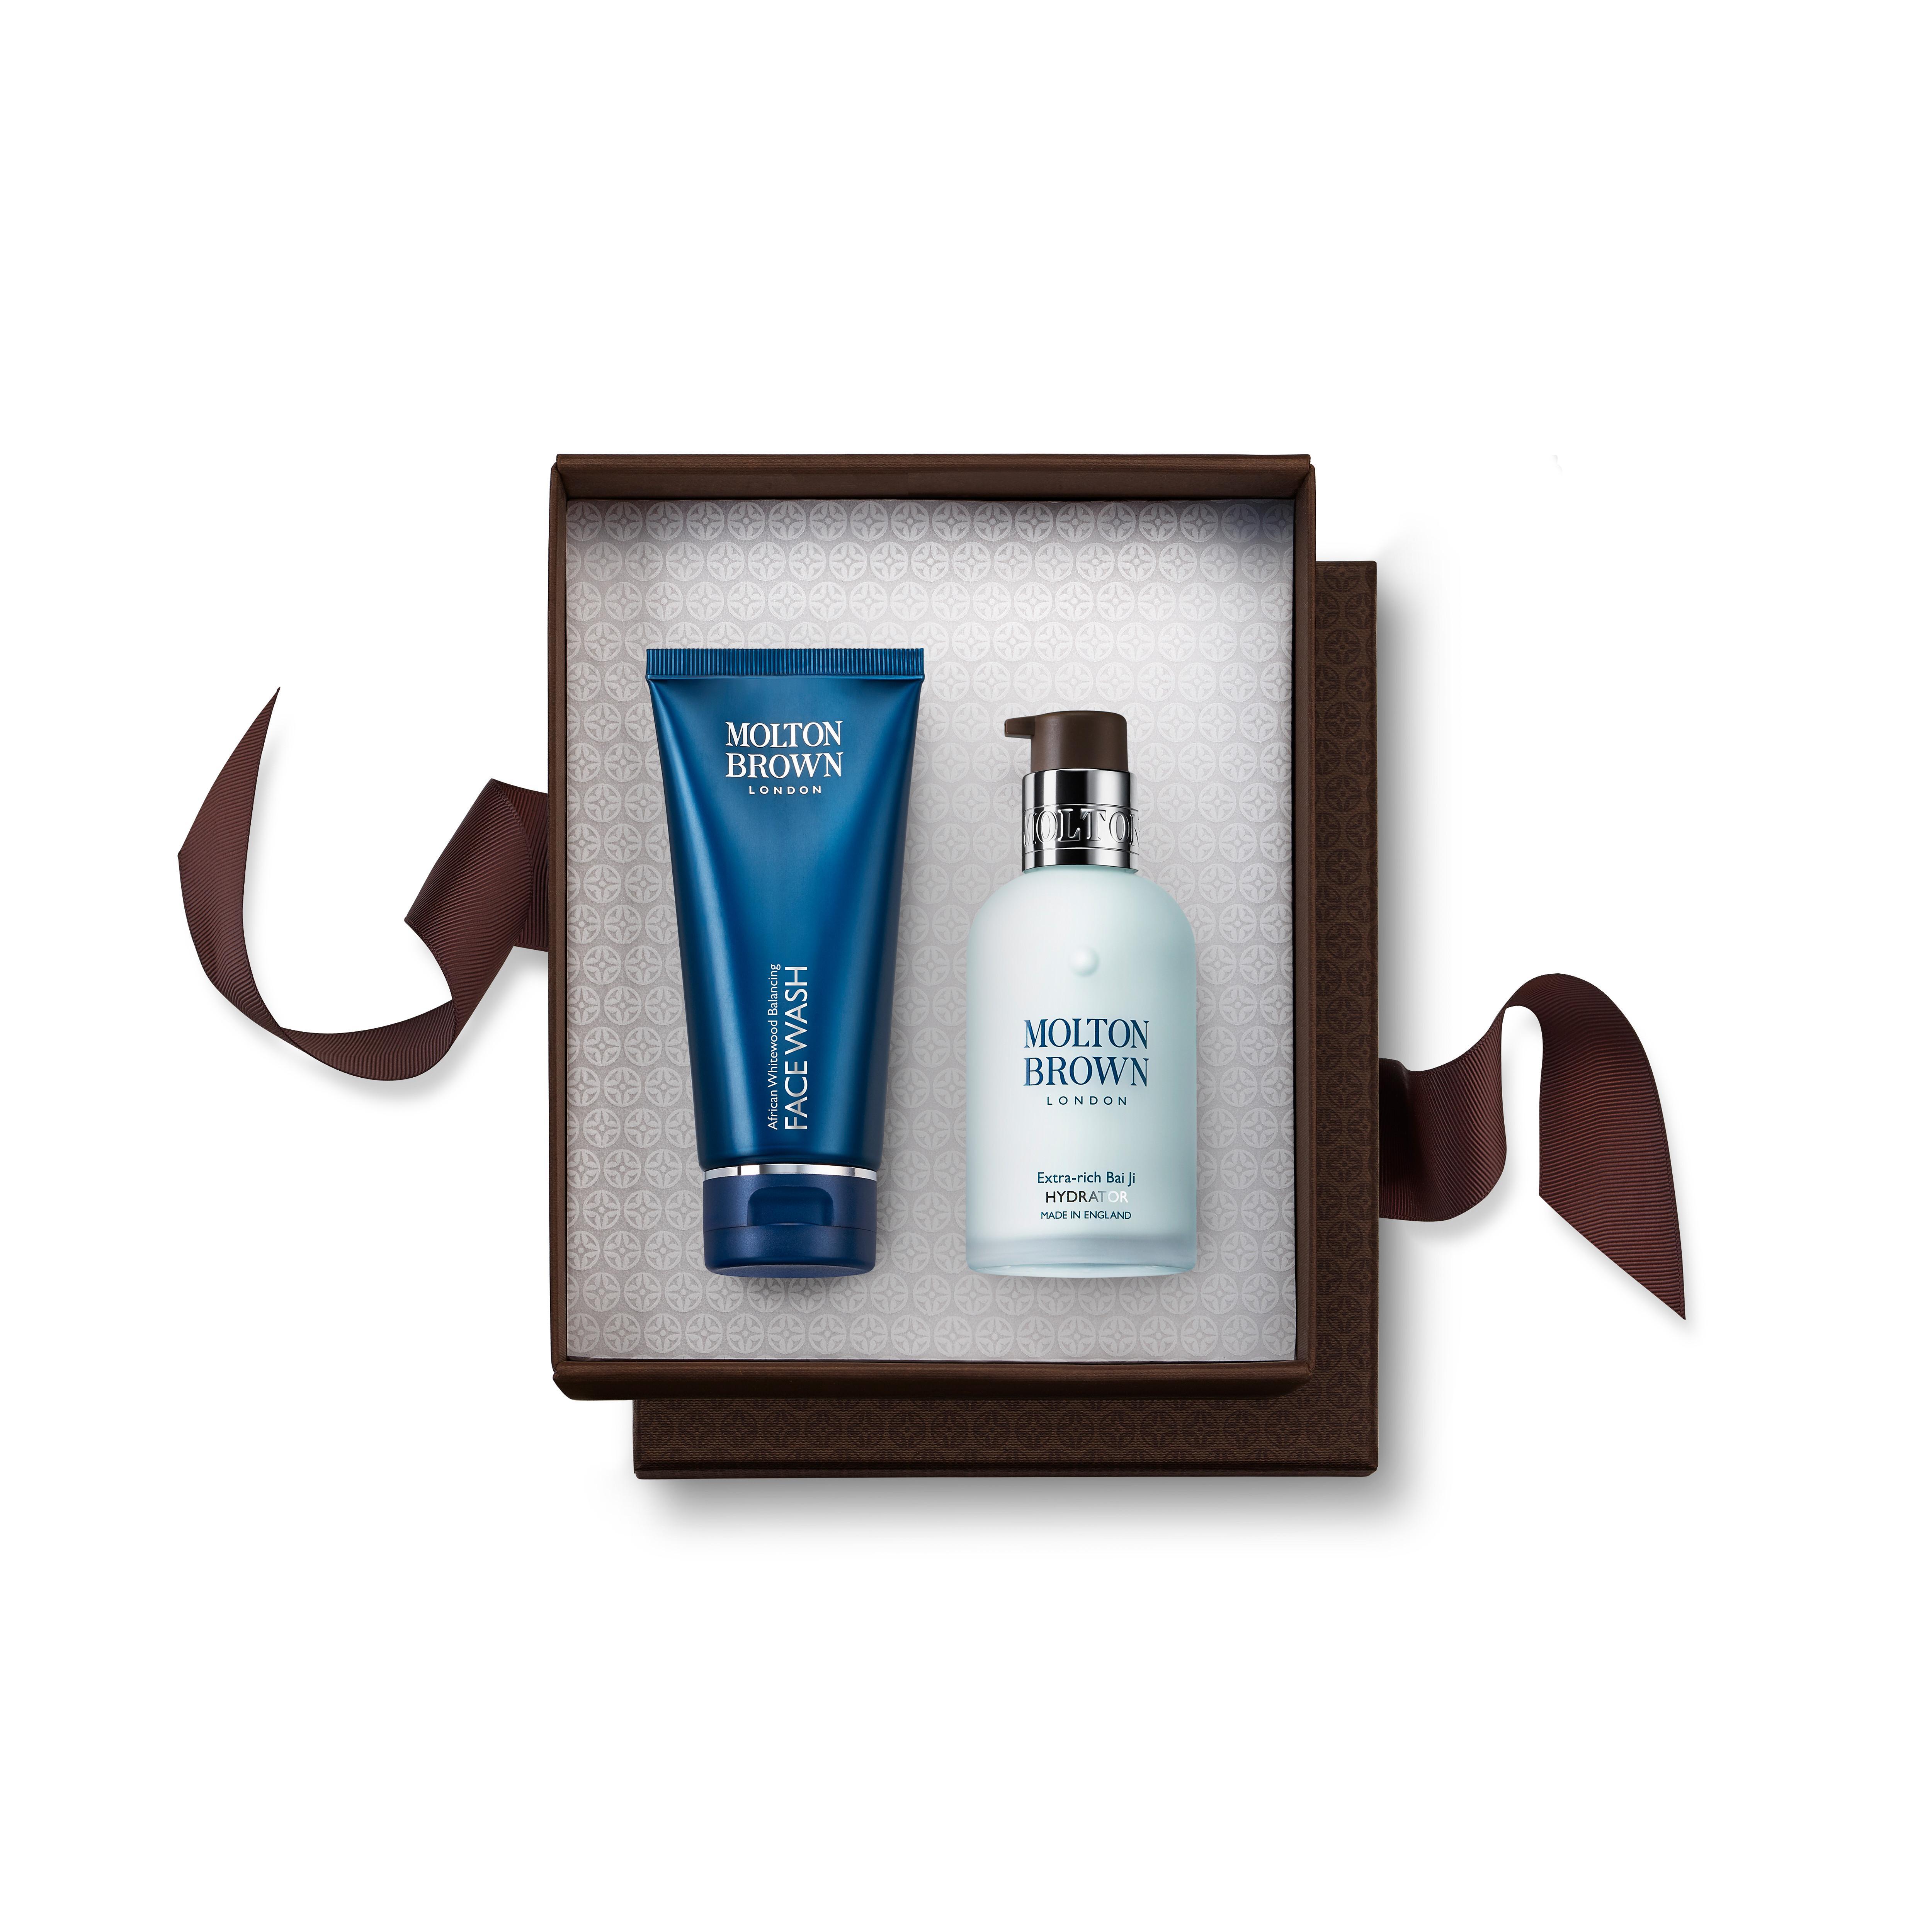 Menu0027s Face Wash u0026 Moisturiser Gift Set for Dry Skin  sc 1 st  Molton Brown & Dry Skin Face Wash u0026 Moisturiser Gift Set   Molton Brown® UK